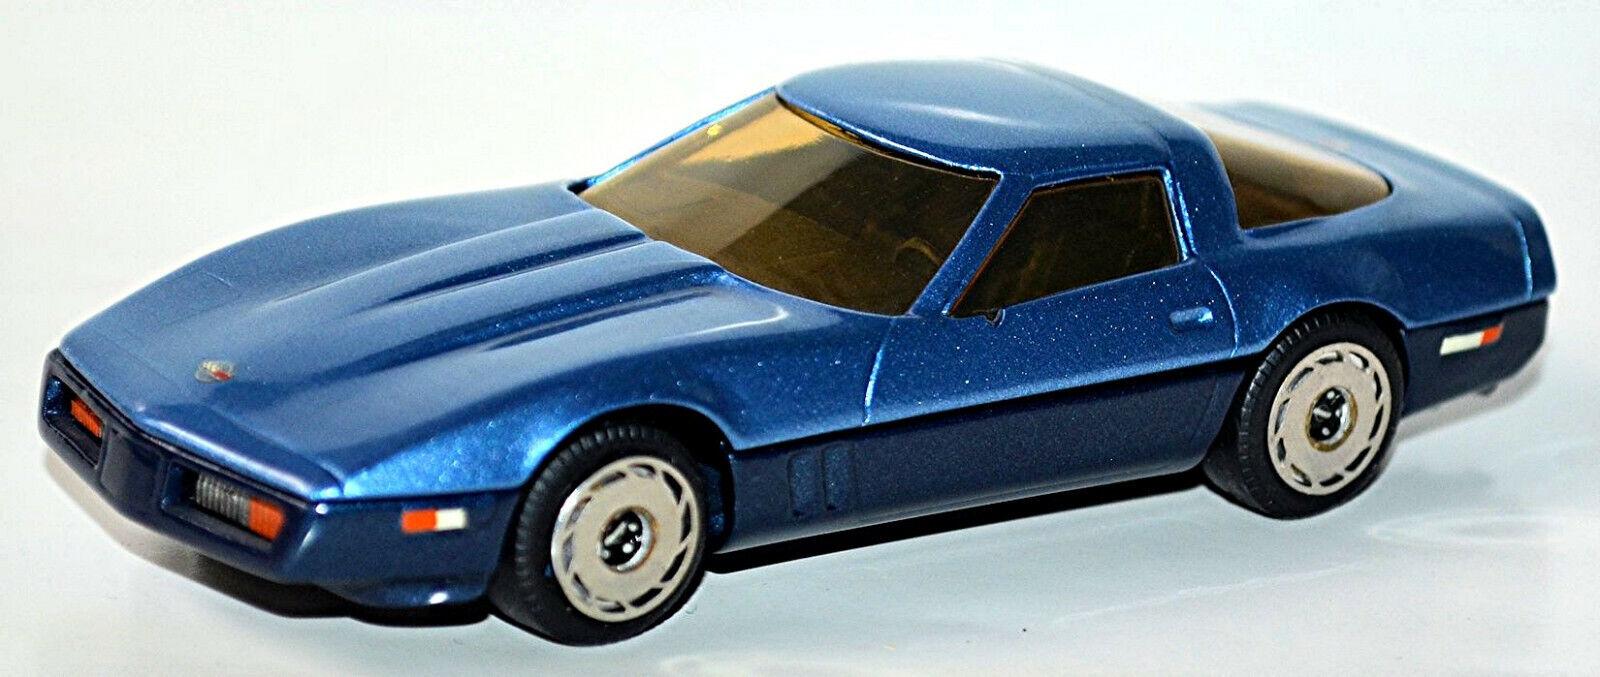 Chevrolet Corvette C4 1983 Coupe blau Blau metallic 1 43 Western Modells